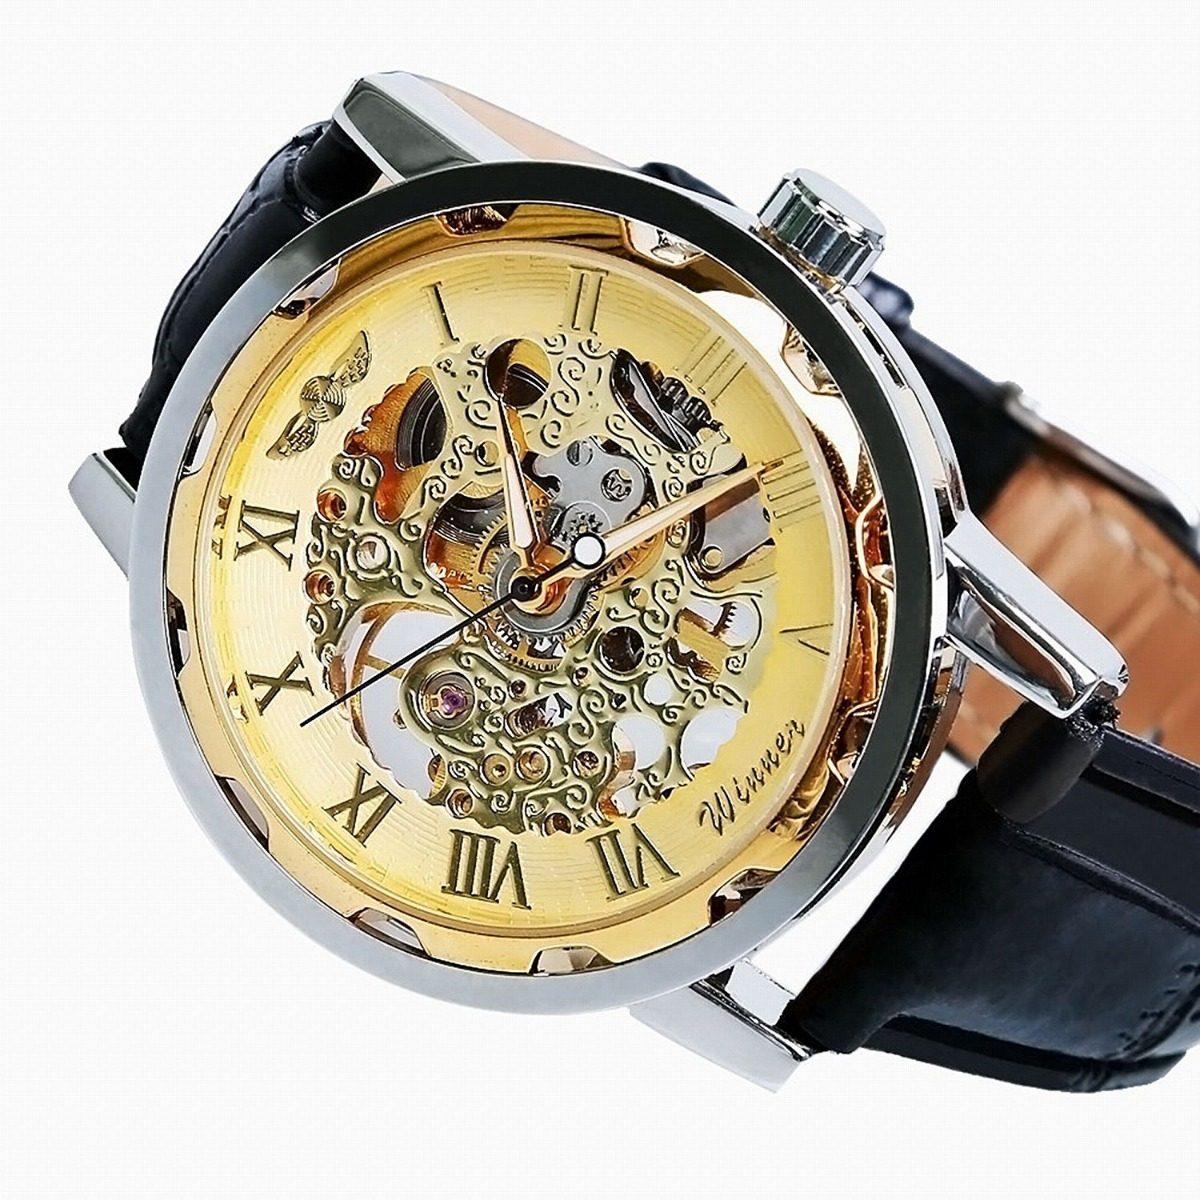 d40a21c94bb relógio masculino automático mecânico dourado pulseira couro. Carregando  zoom.